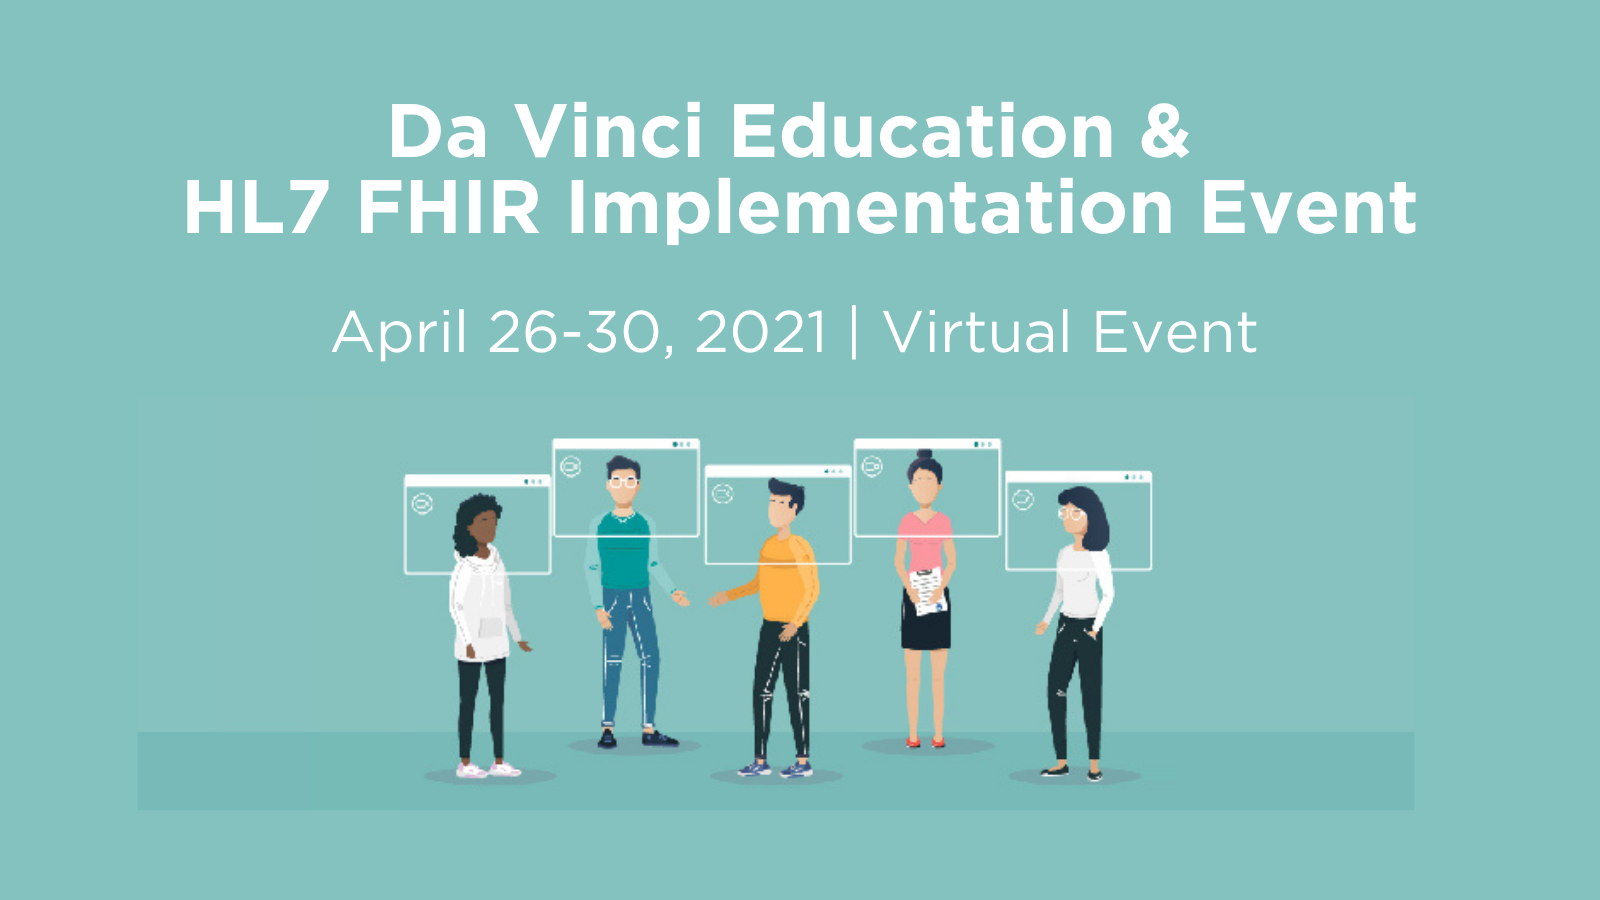 Da Vinci Education & Implementation Twitter Post